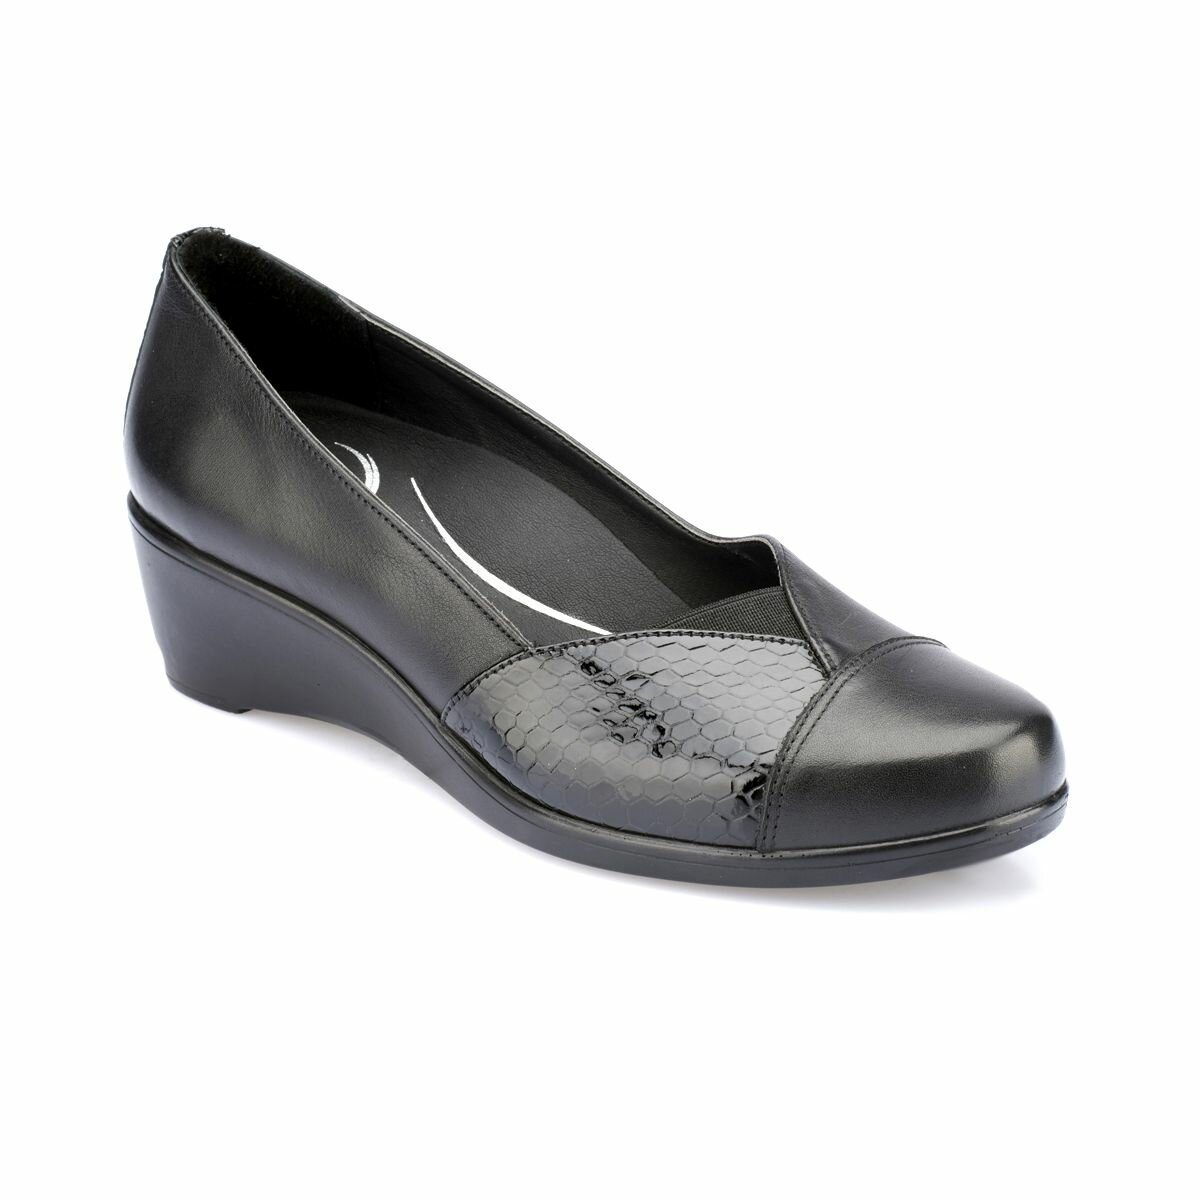 FLO 82.100142.Z Black Women Shoes Polaris 5 Point